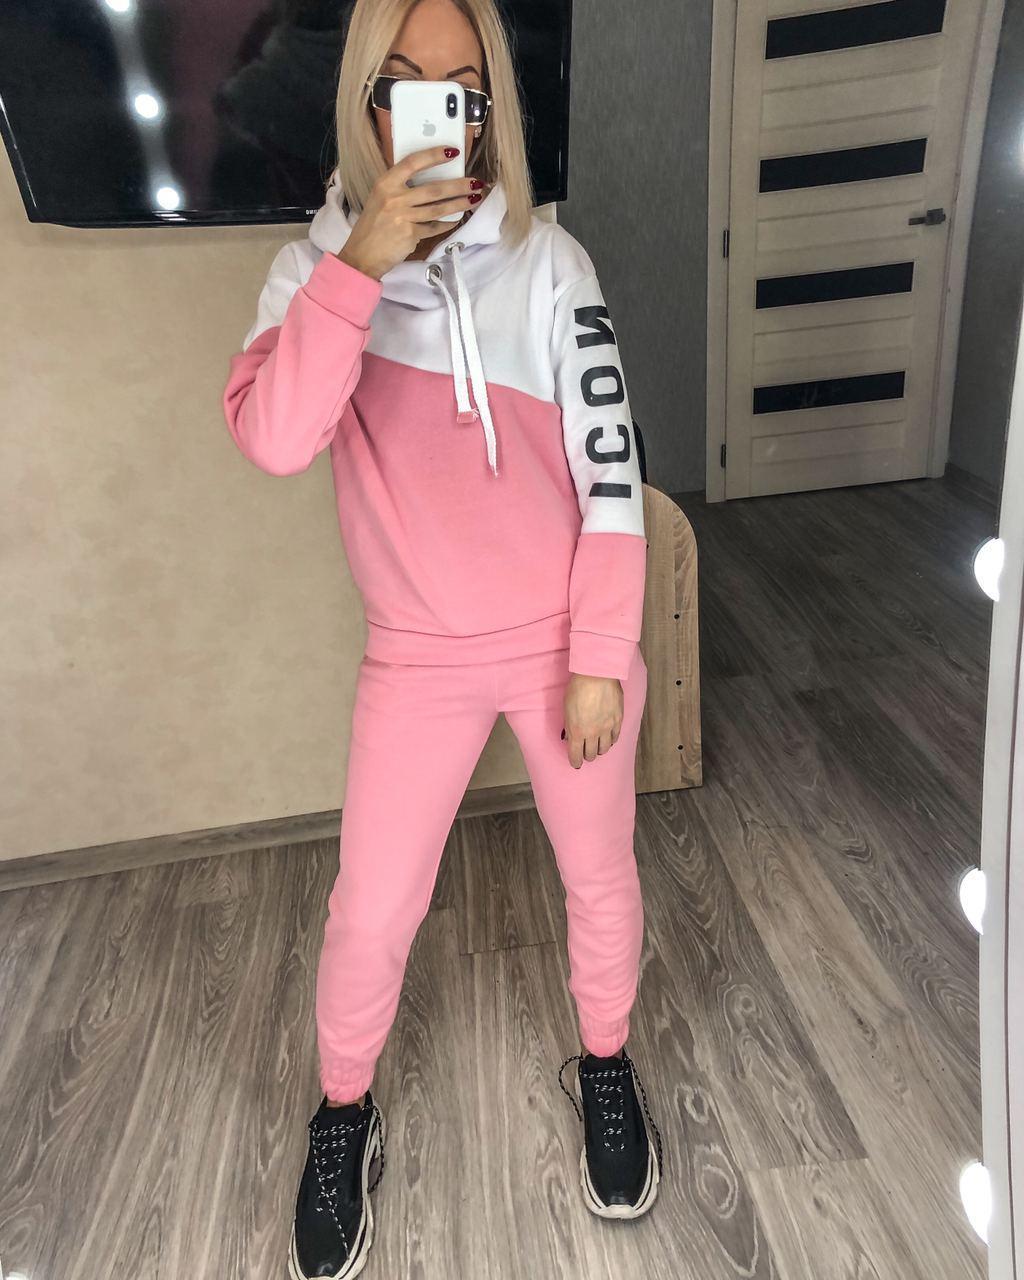 Женский зимний теплый на флисе  спортивный костюм розово-белого цвета